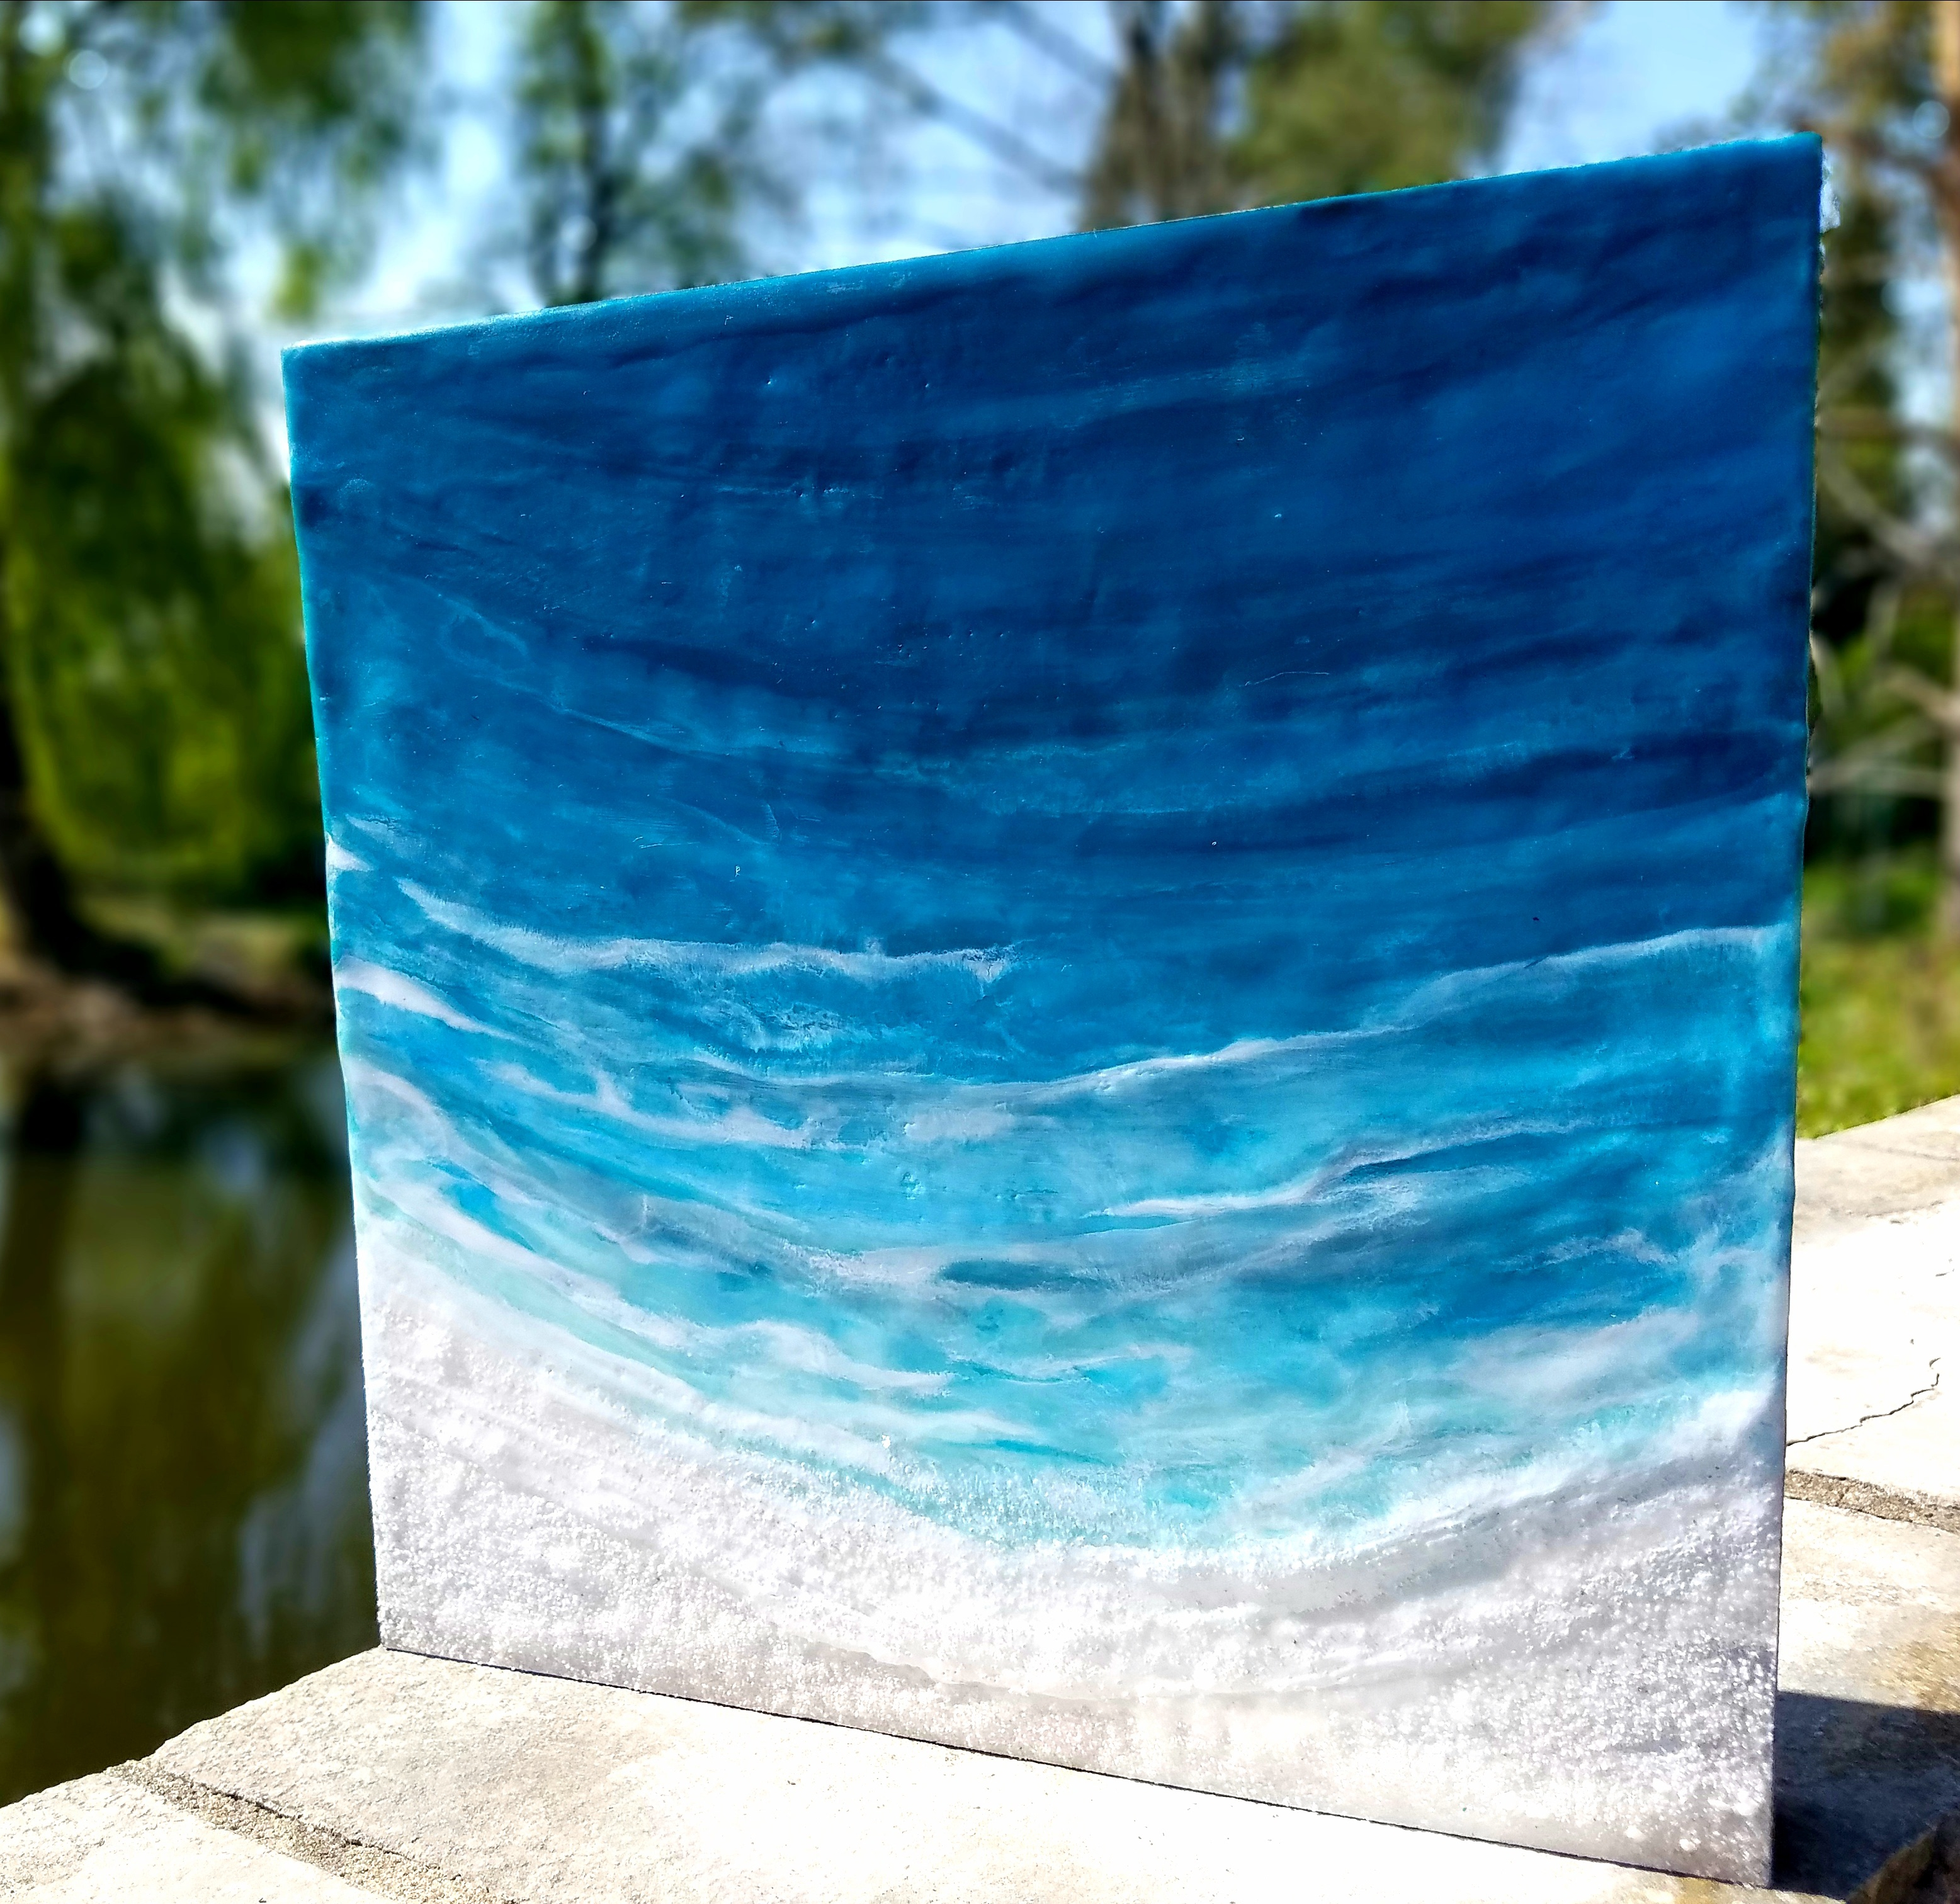 Oceanblues 12 Enkaustik Sand und Wachs 25 x 25 cm